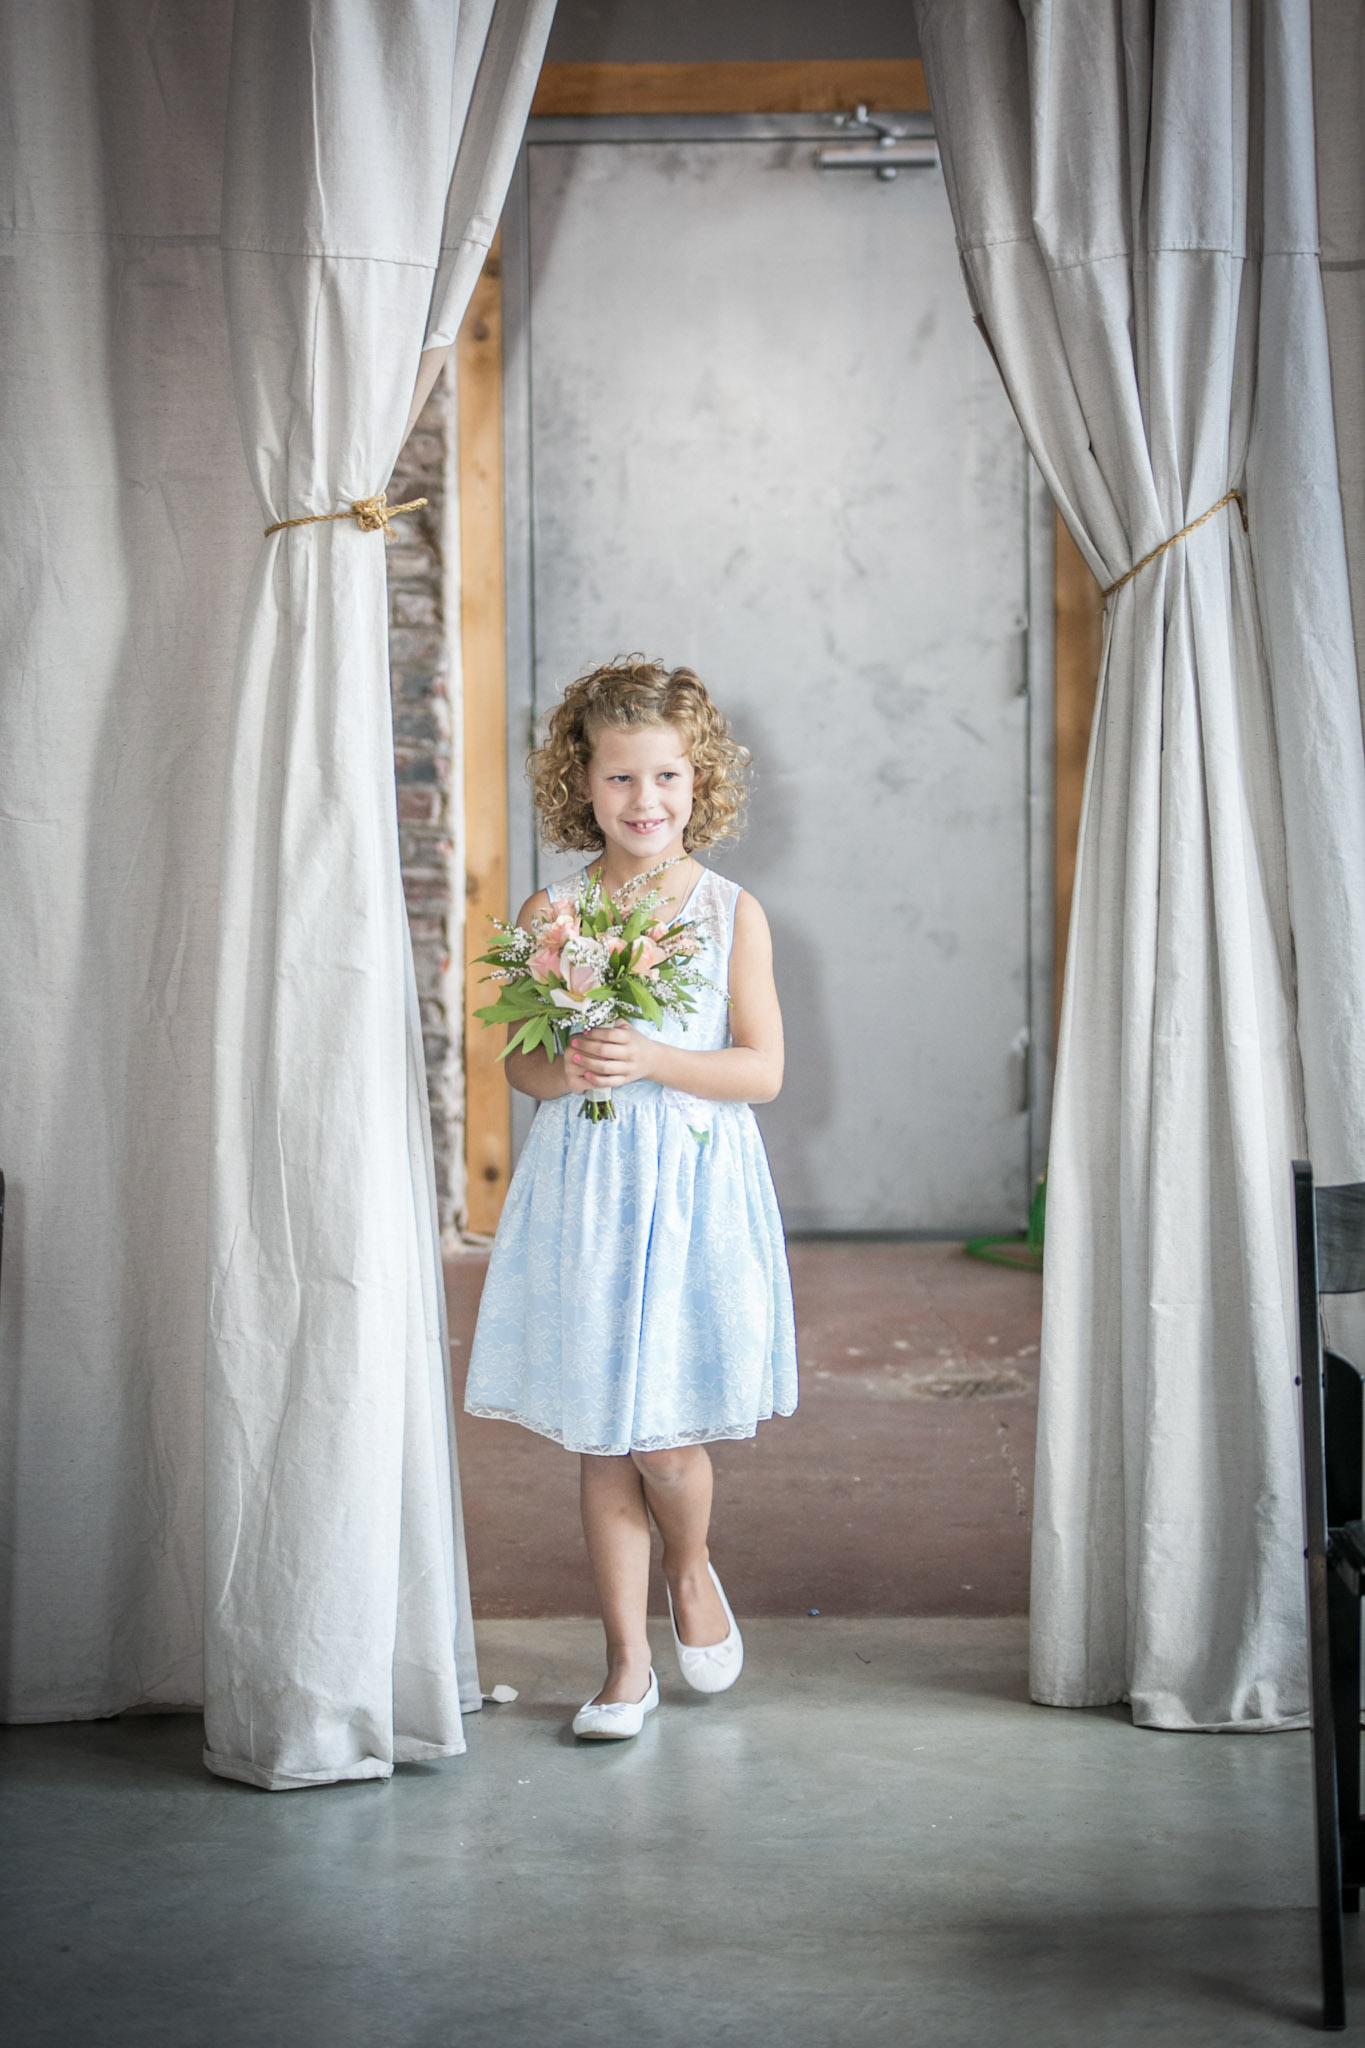 The_Vow_Exchange_Kansas_City_Small_Budget_Wedding_Venue_Lisa & John_036.jpg